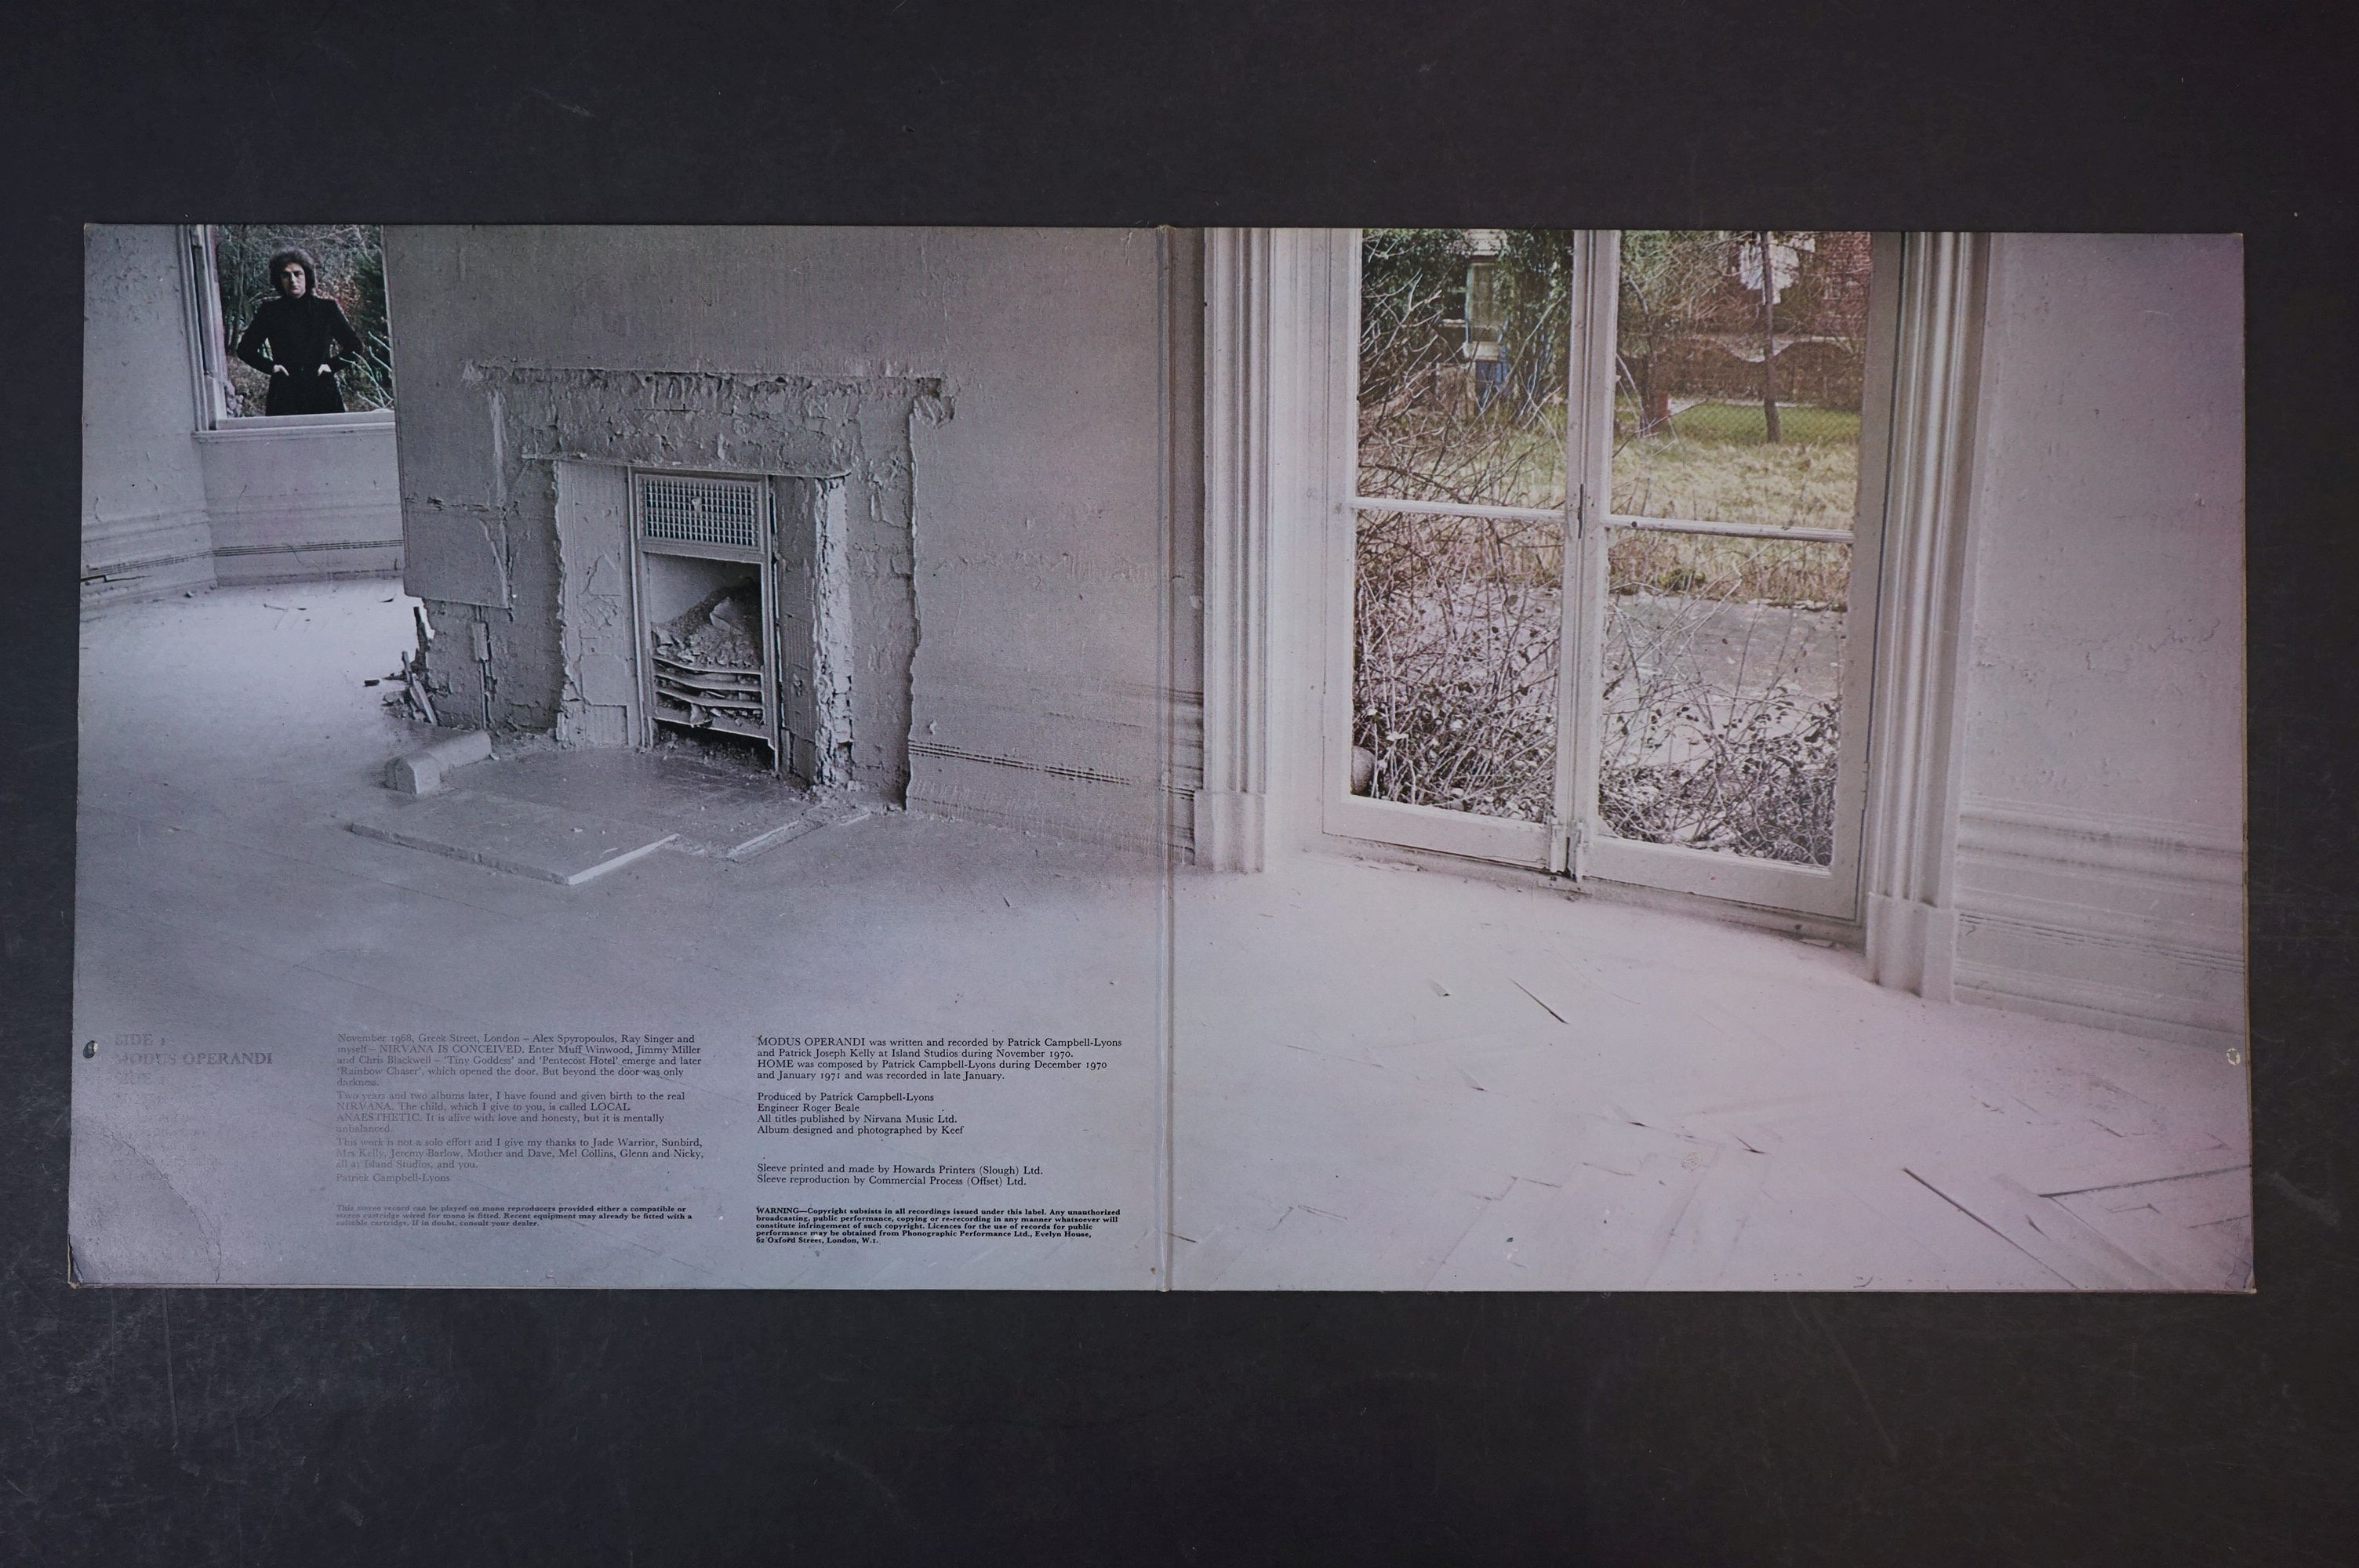 Vinyl - Nirvana Local Anaesthetic LP on Vertigo VO 6360031 gatefold sleeve, swirl logo, swirl - Image 3 of 8